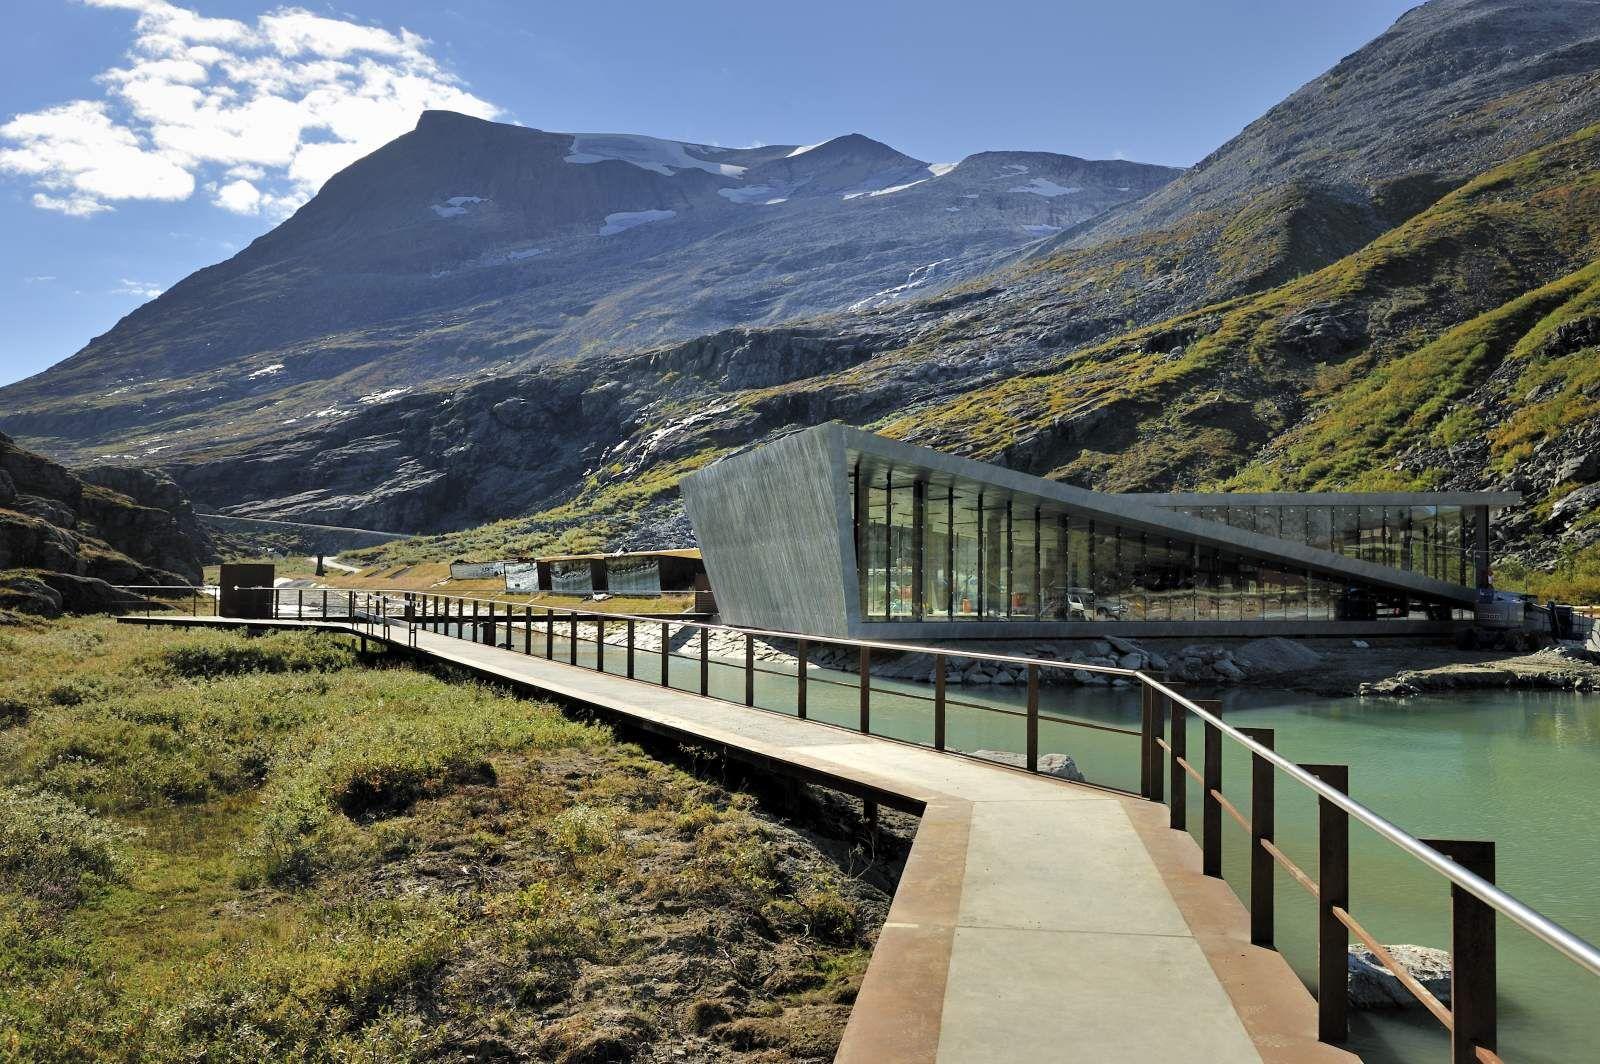 туристический центр Trollstigen, Долины Норвегии. Ромсдал